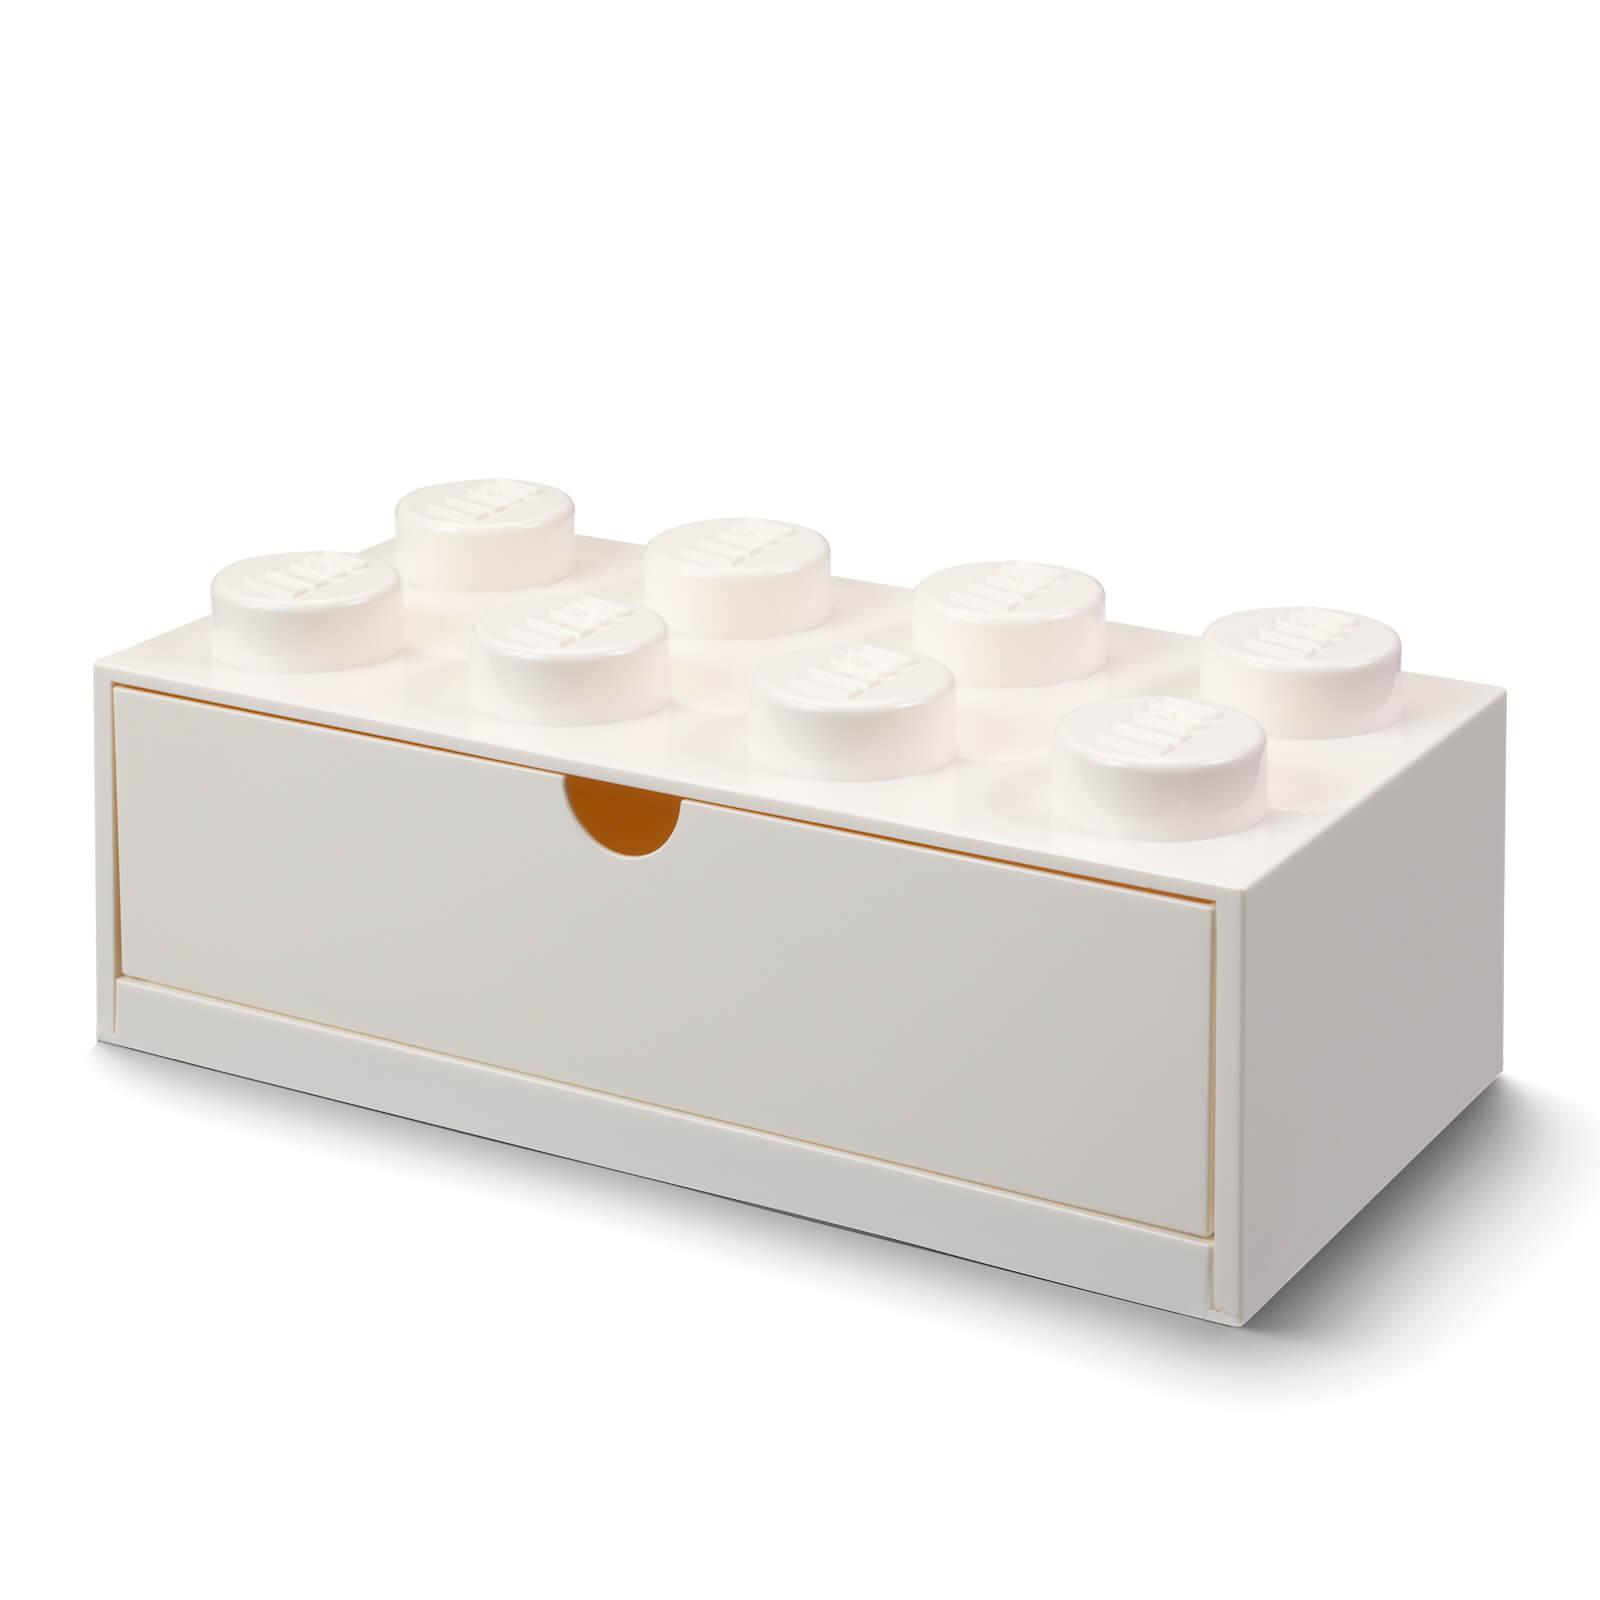 Image of LEGO Storage Desk Drawer 8 - White